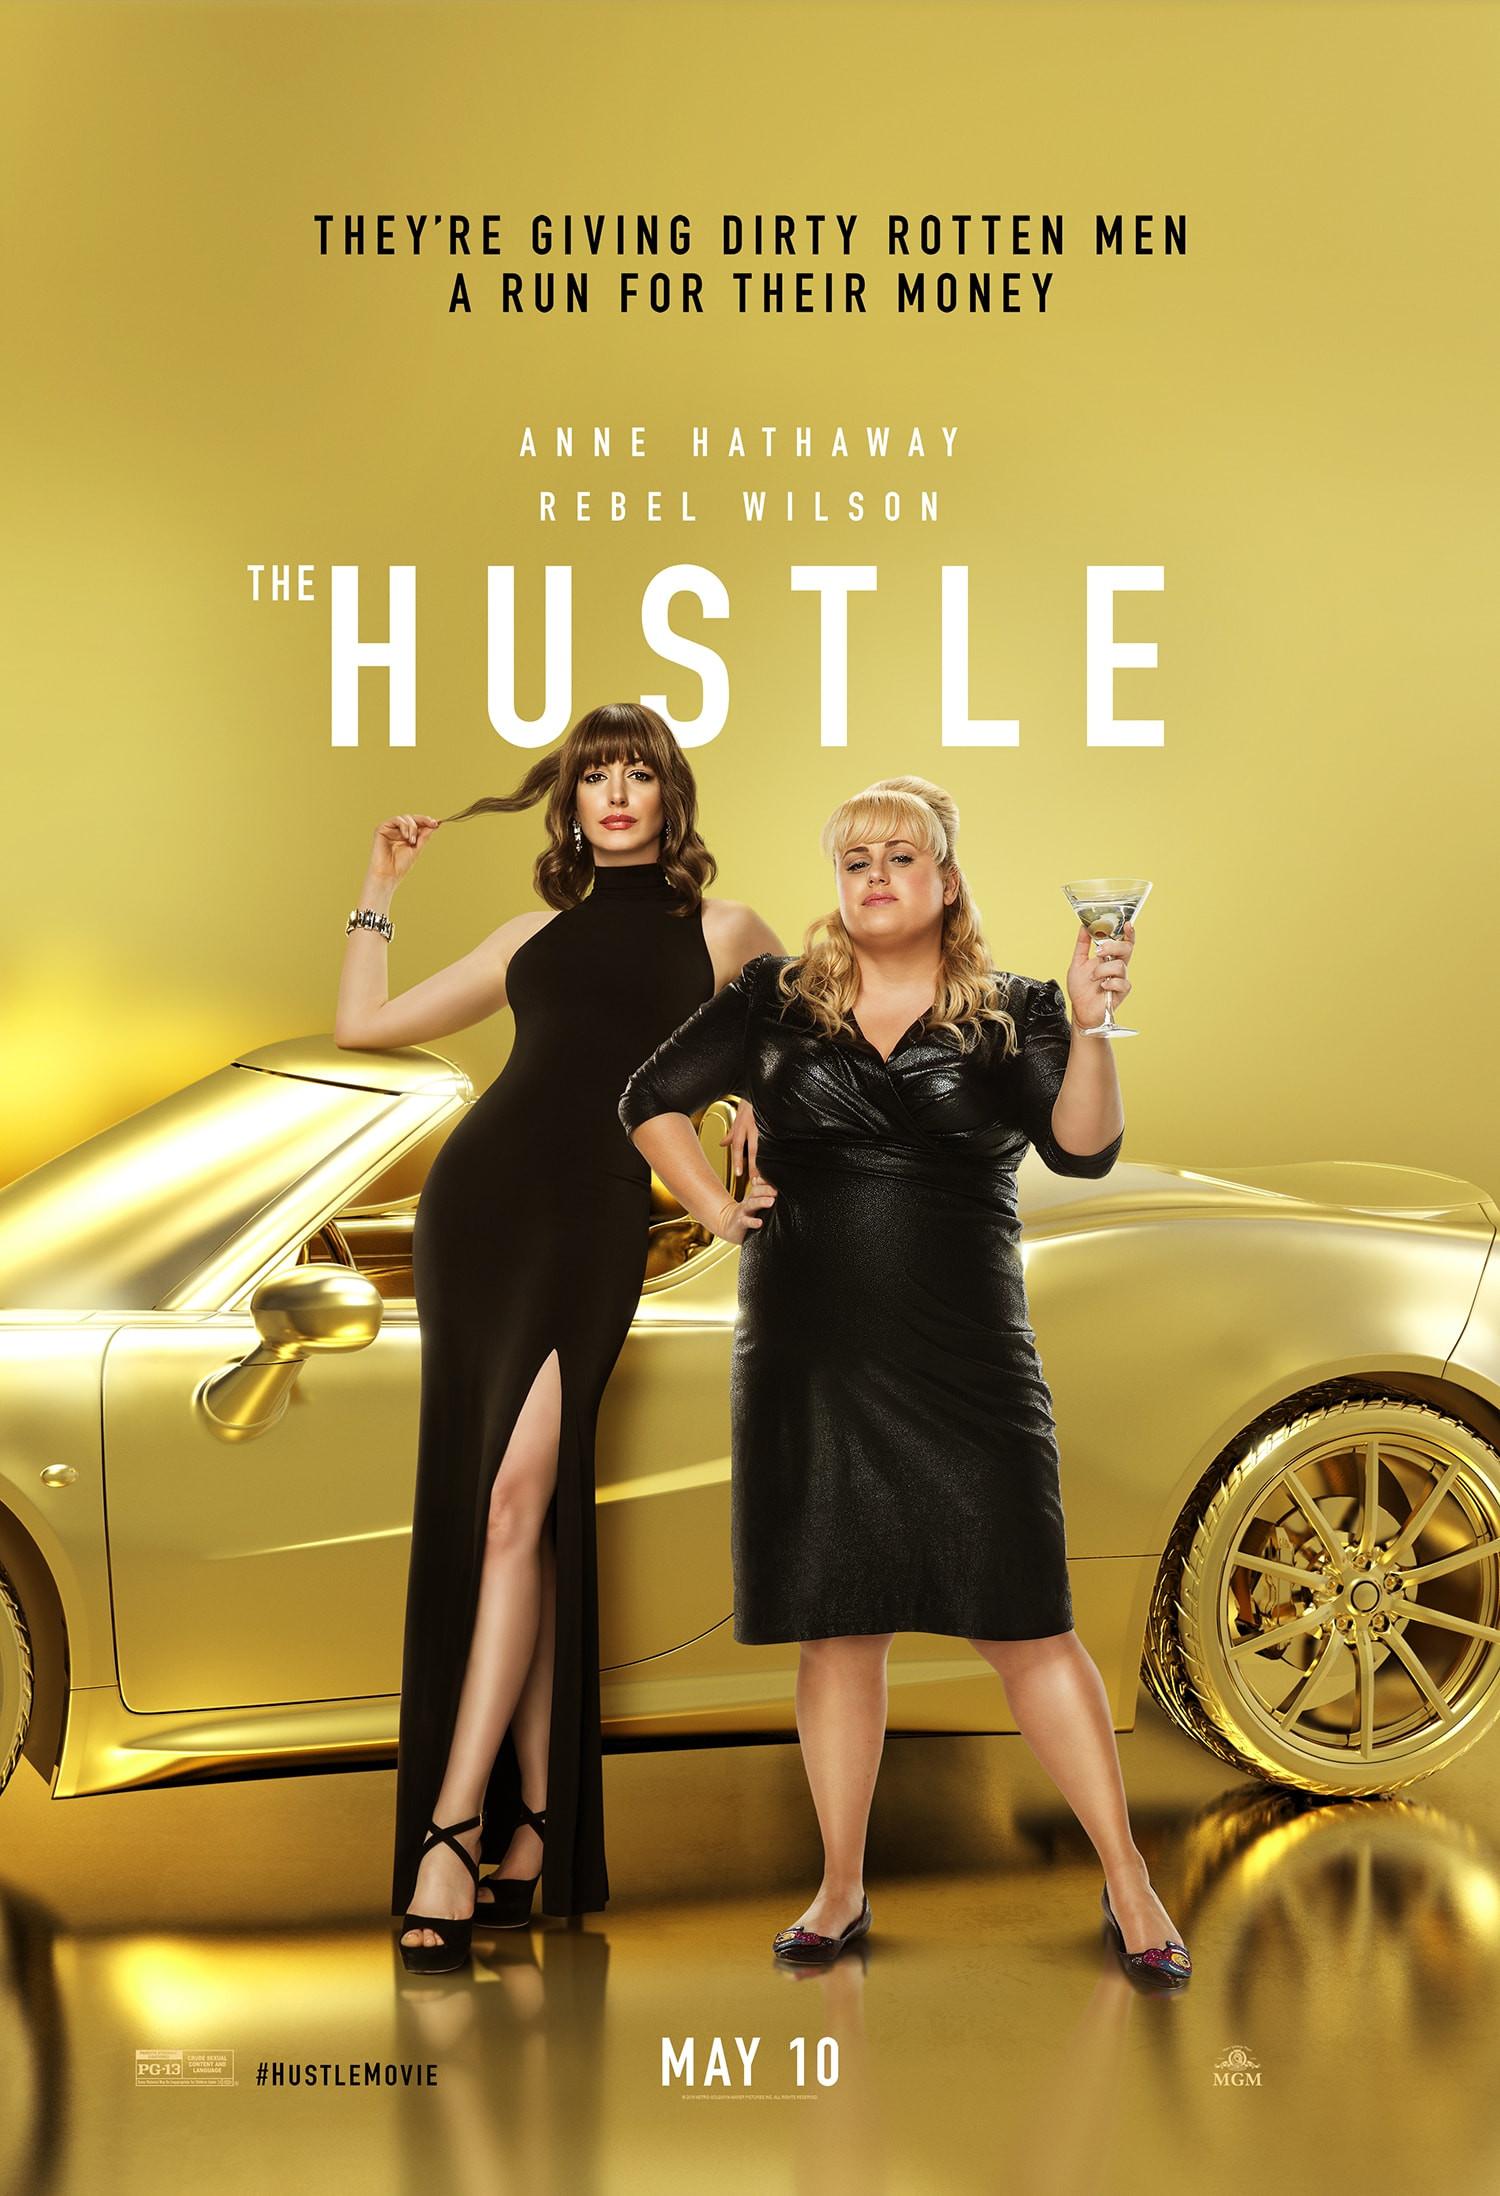 the-hustle-Hustle1_rgb-min.jpg